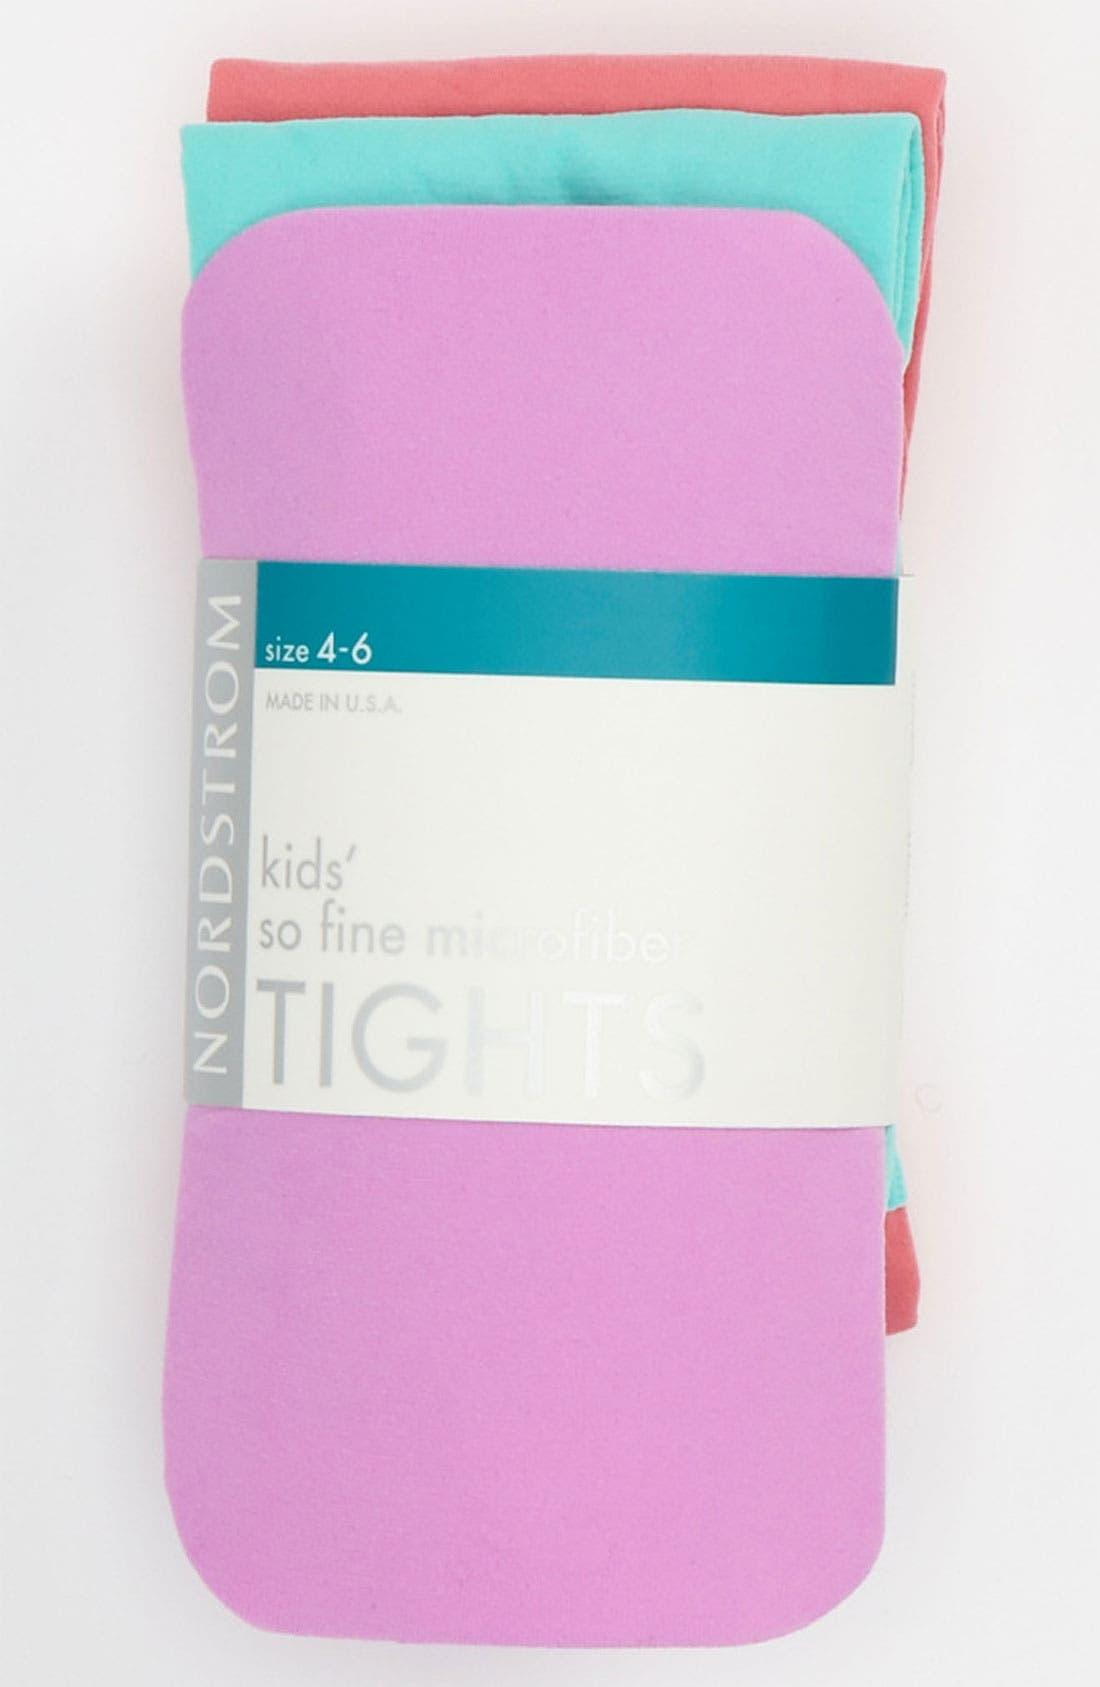 Main Image - Nordstrom 'So Fine' Microfiber Tights (3-Pack) (Girls)